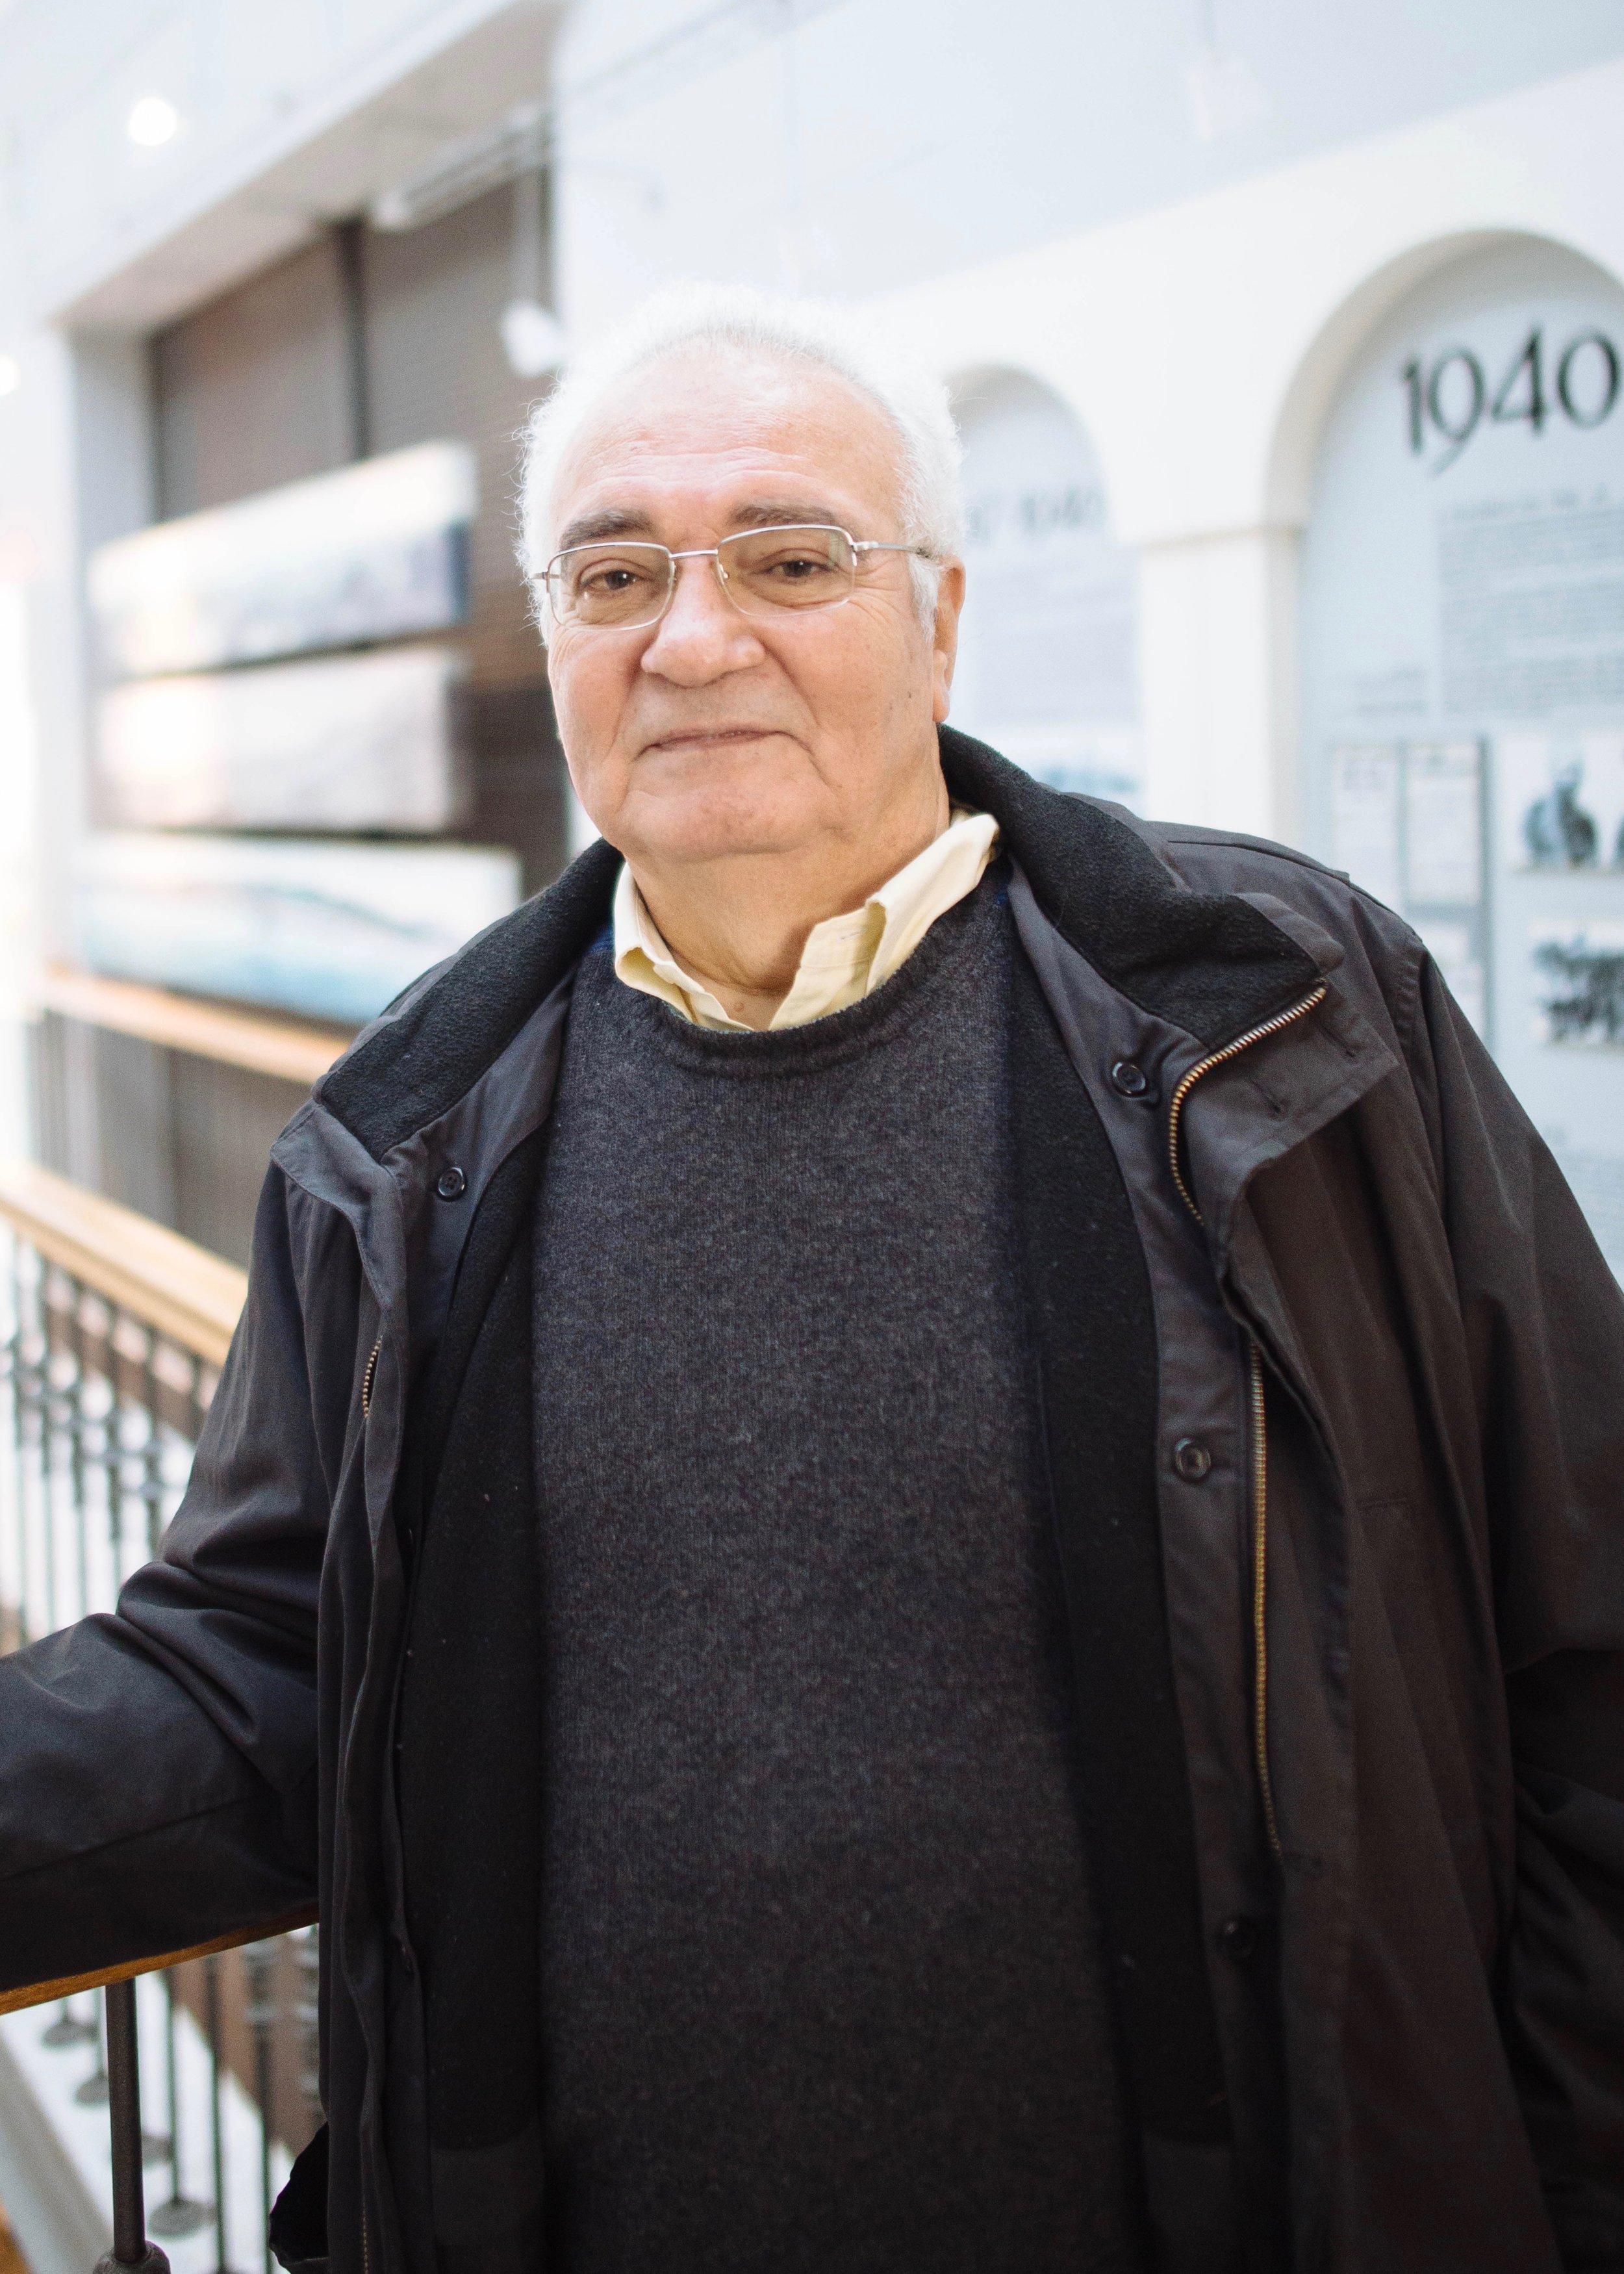 Jack Benmayor - One of the few remaining speakers of the Ladino language in Thessaloniki.